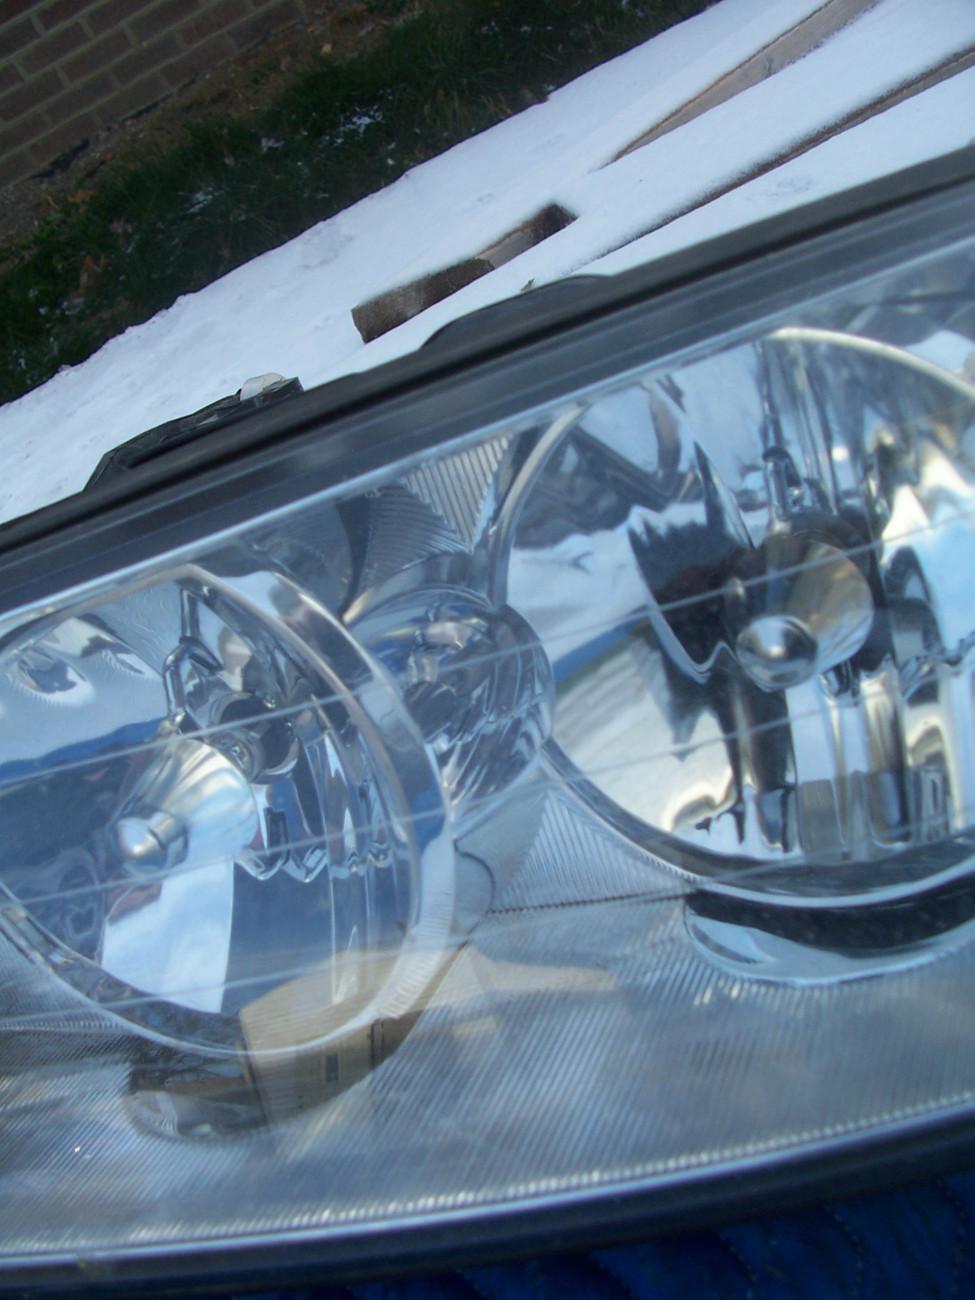 2005 Towncar Left Headlight Oem Broken and 34 similar items